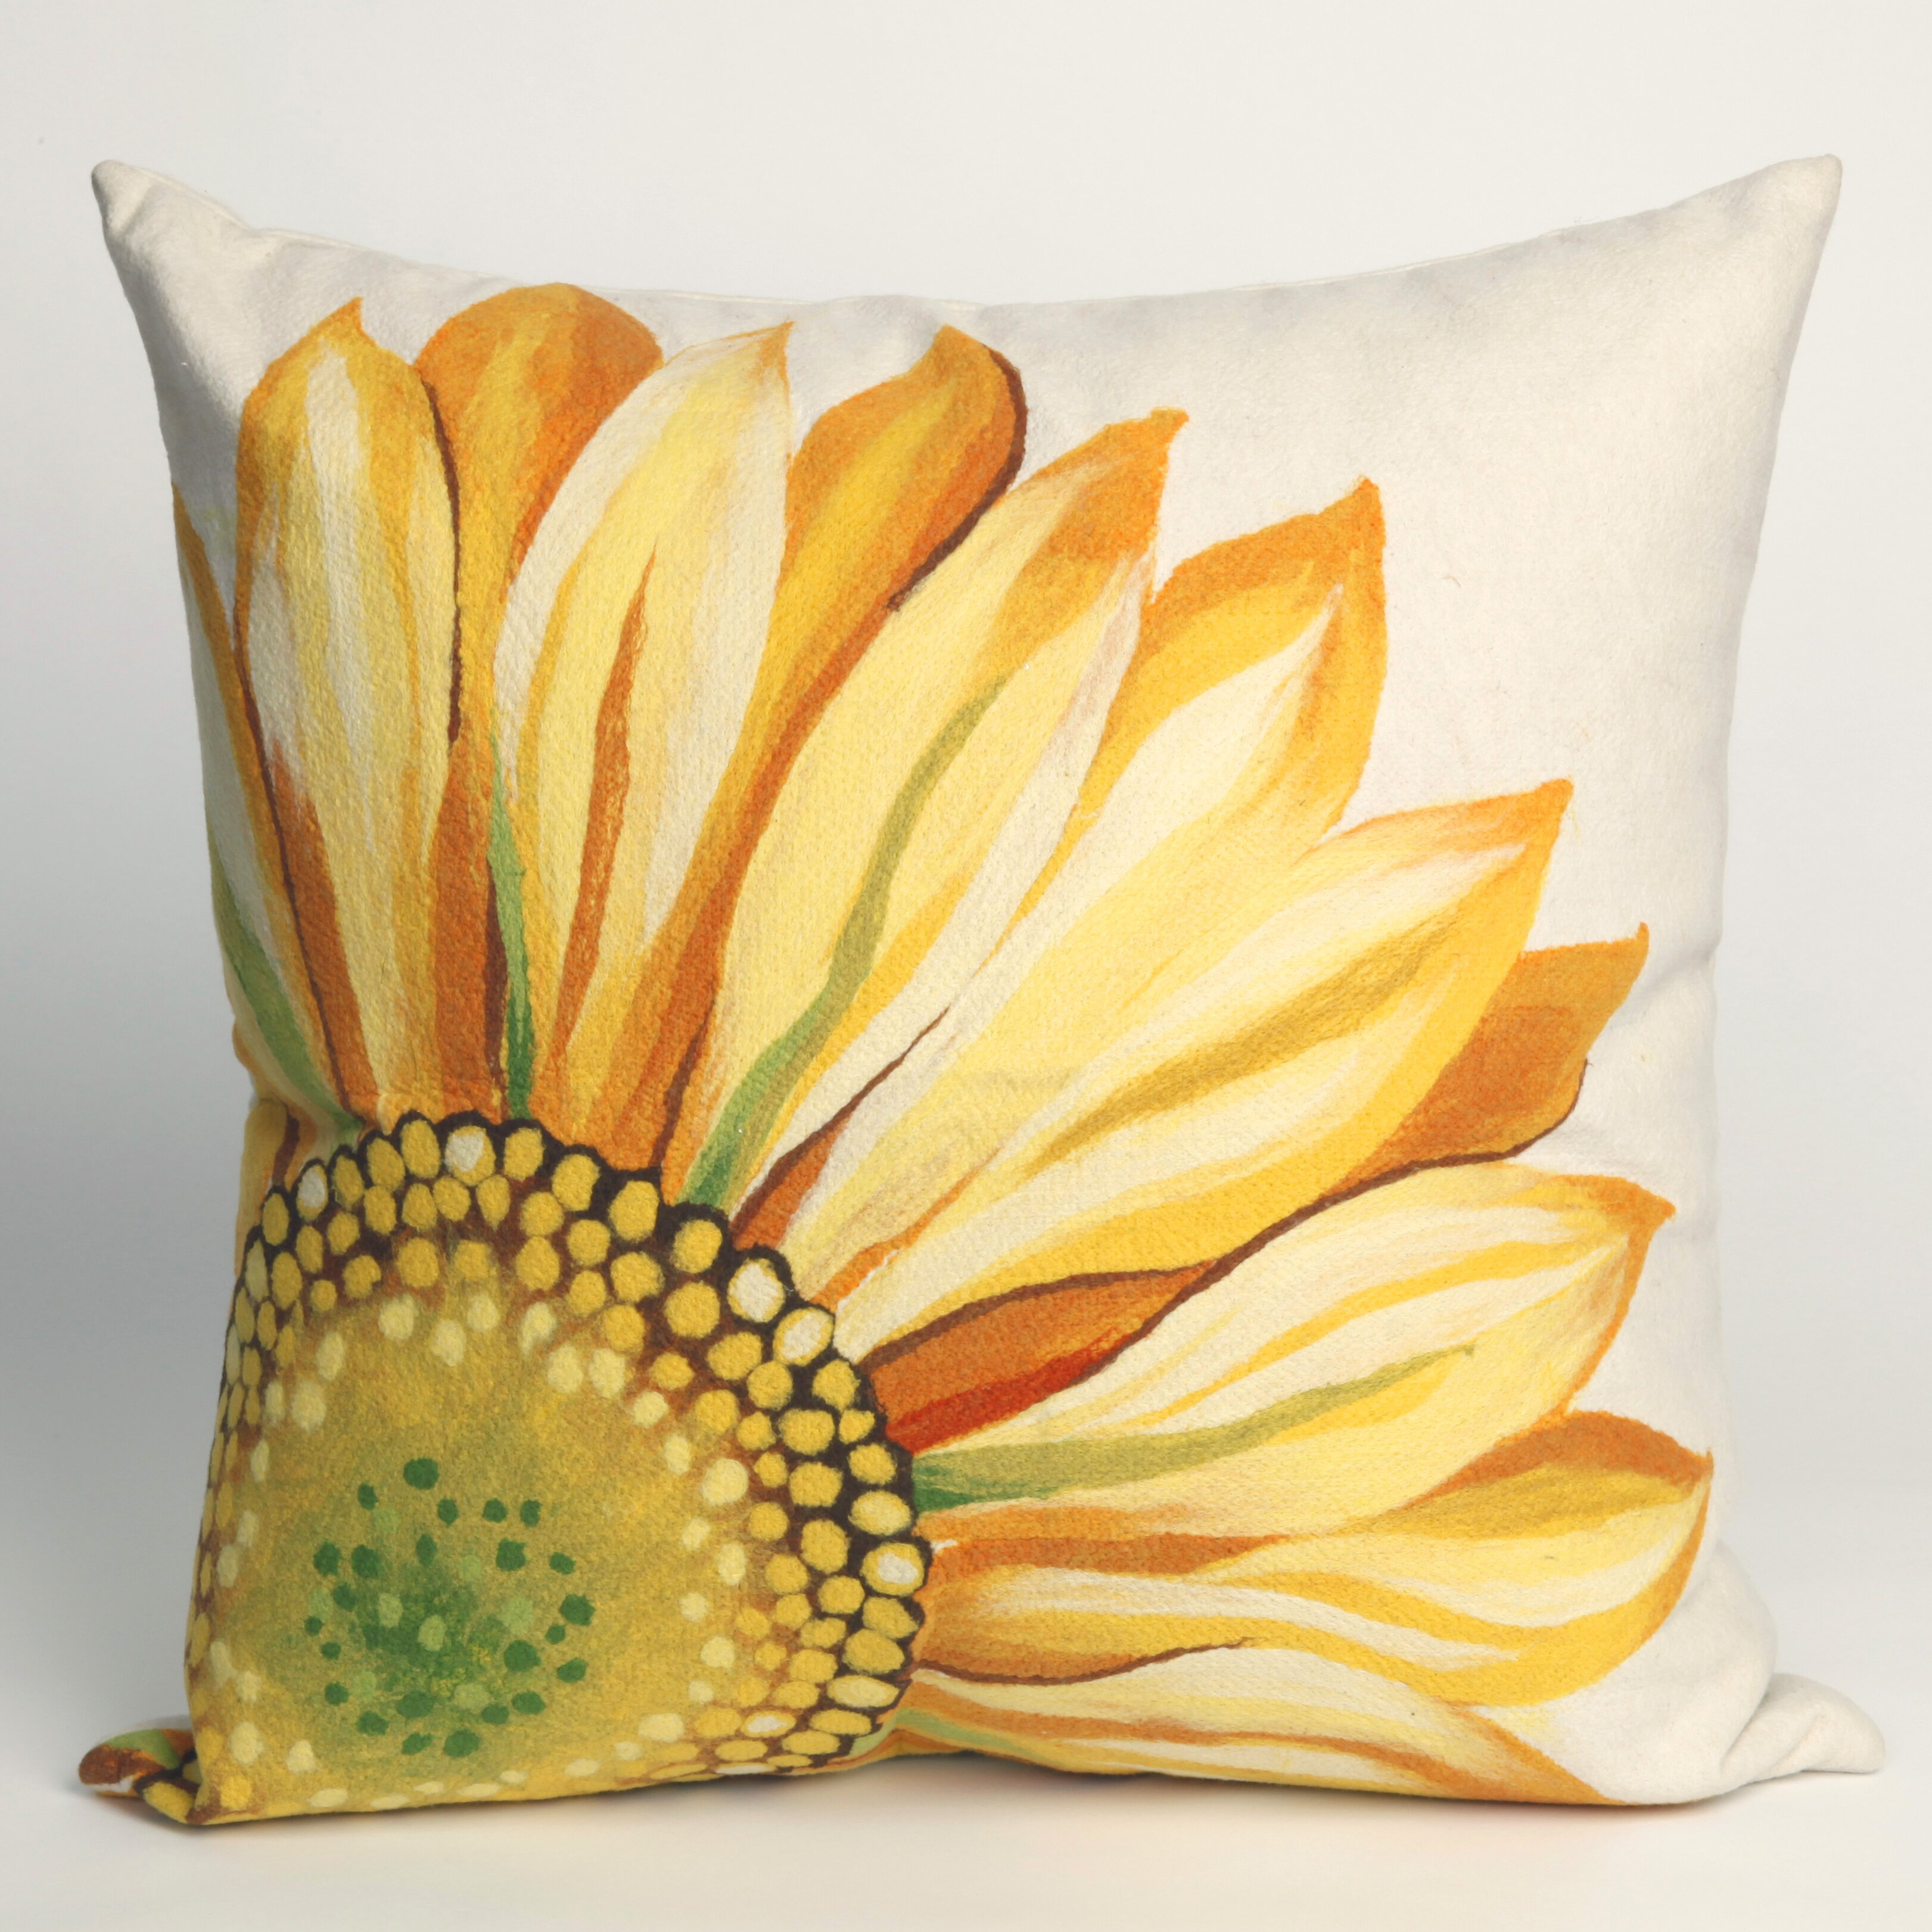 Decorative Pillows With Sunflowers : Liora Manne Sunflower Indoor/Outdoor Throw Pillow & Reviews Wayfair